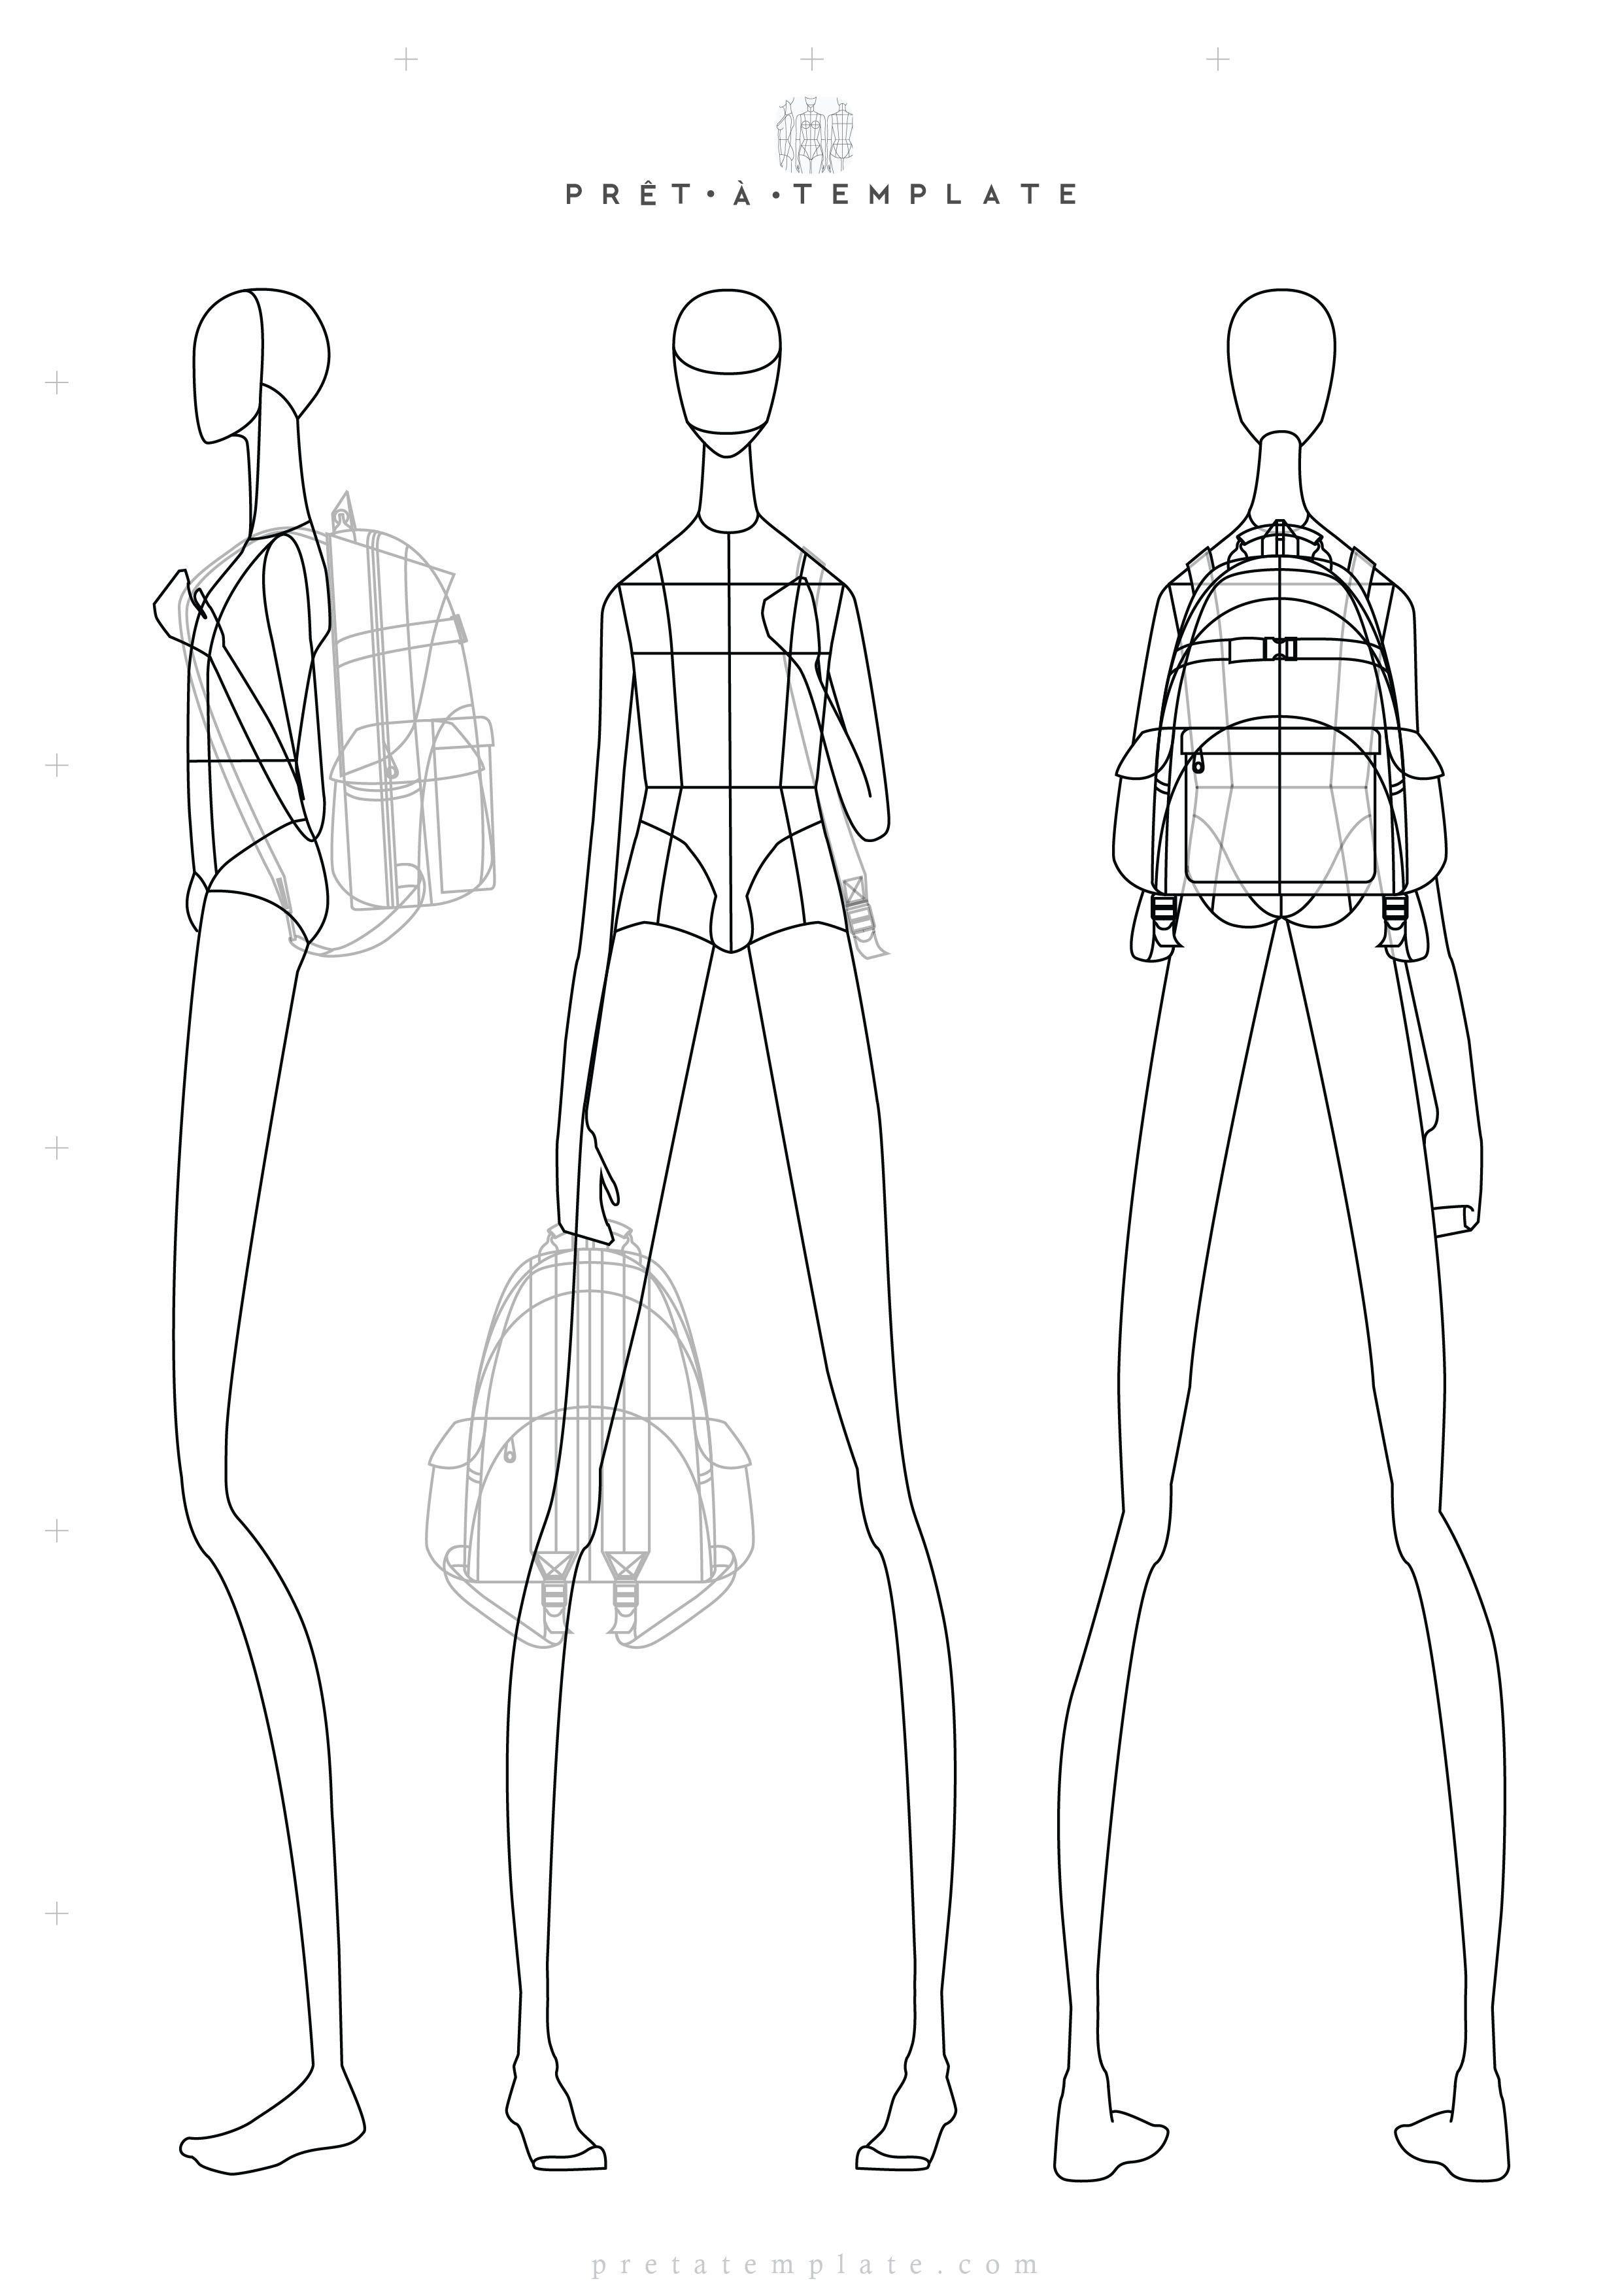 Man Croqui Body Figure Fashion Template D I Y Your Own Fashion Sketchbook Keywords Fashion Fashion Figure Templates Fashion Figures Fashion Design Template